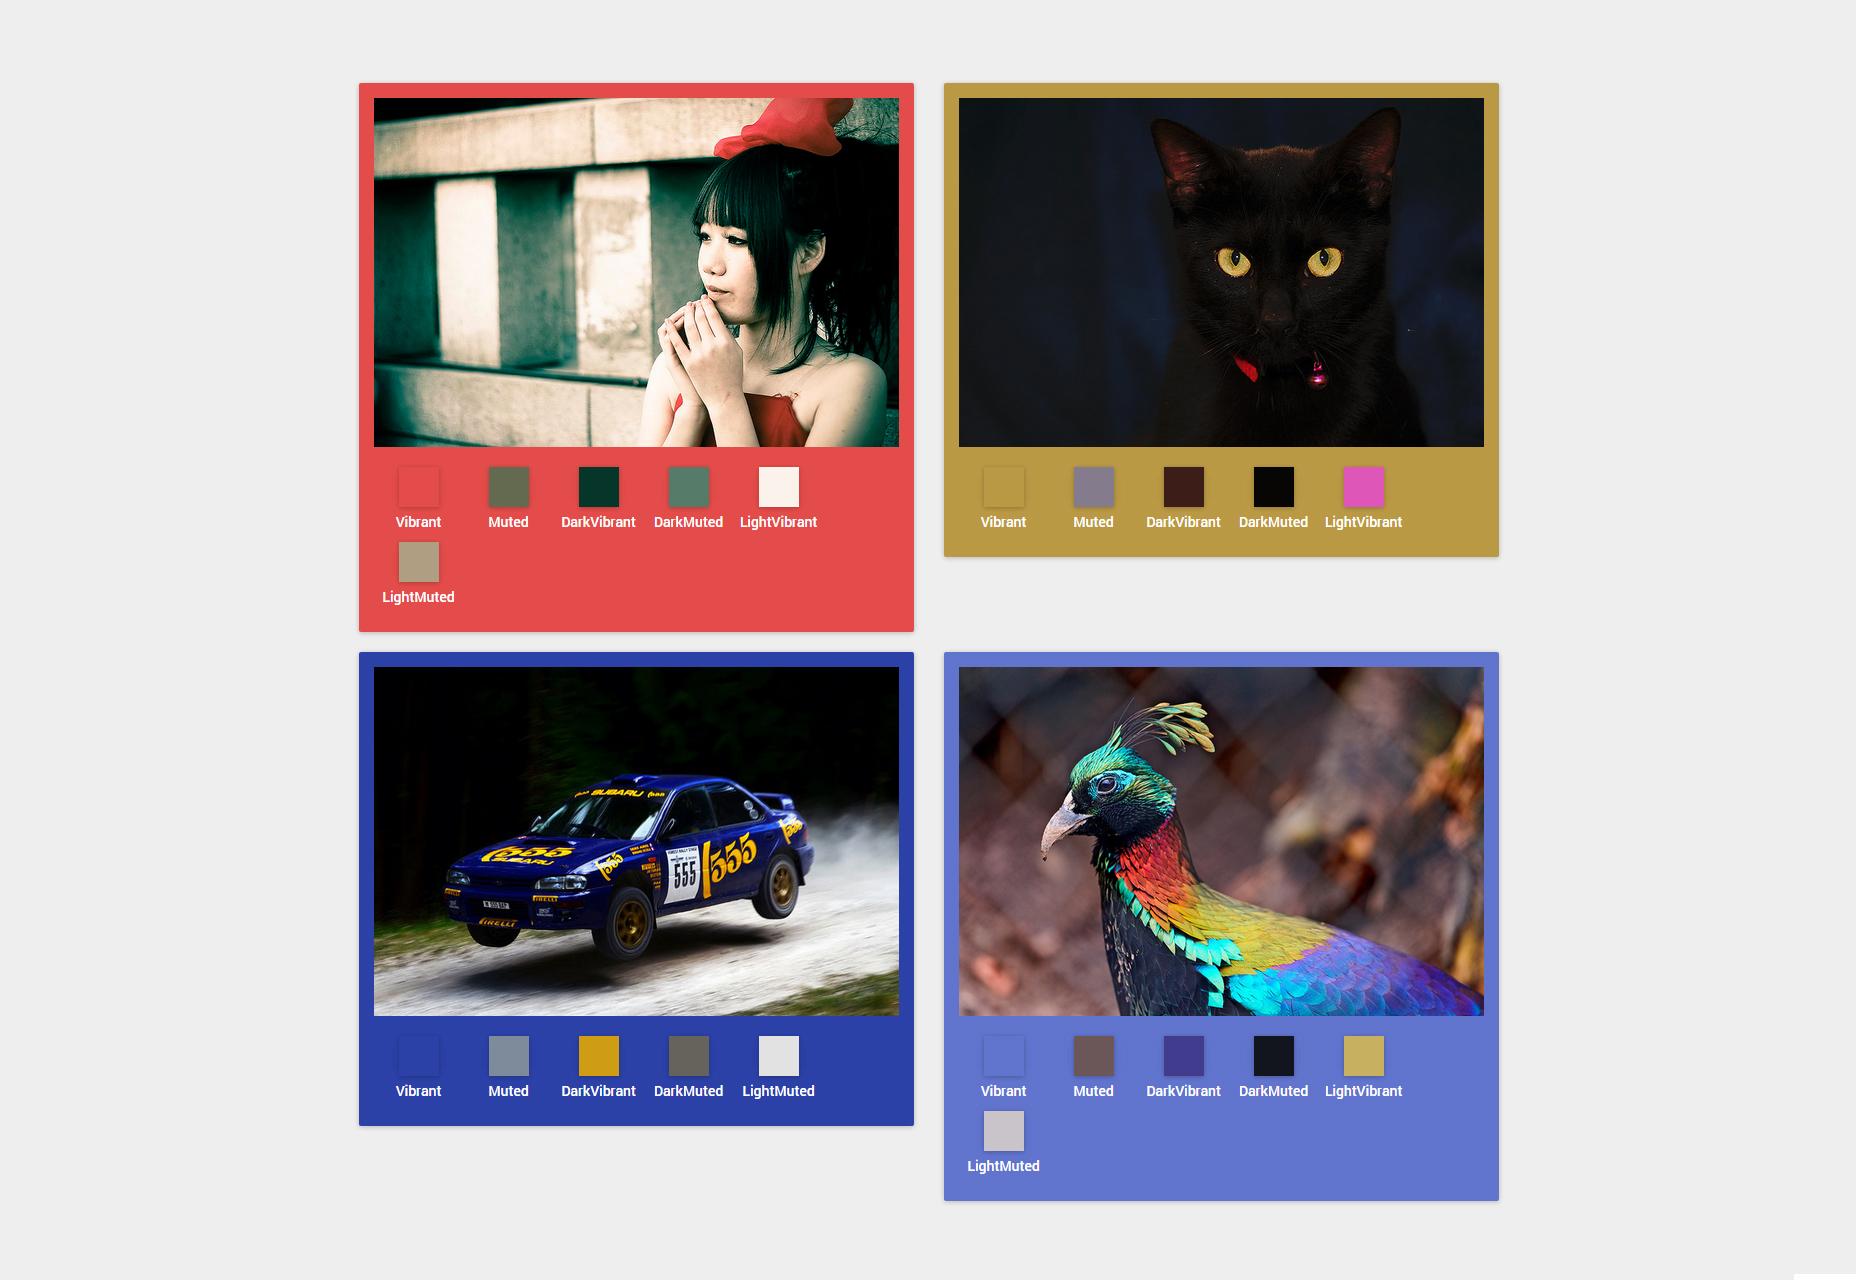 Vibrant.js: Extractor de JavaScript de colores de imagen prominente